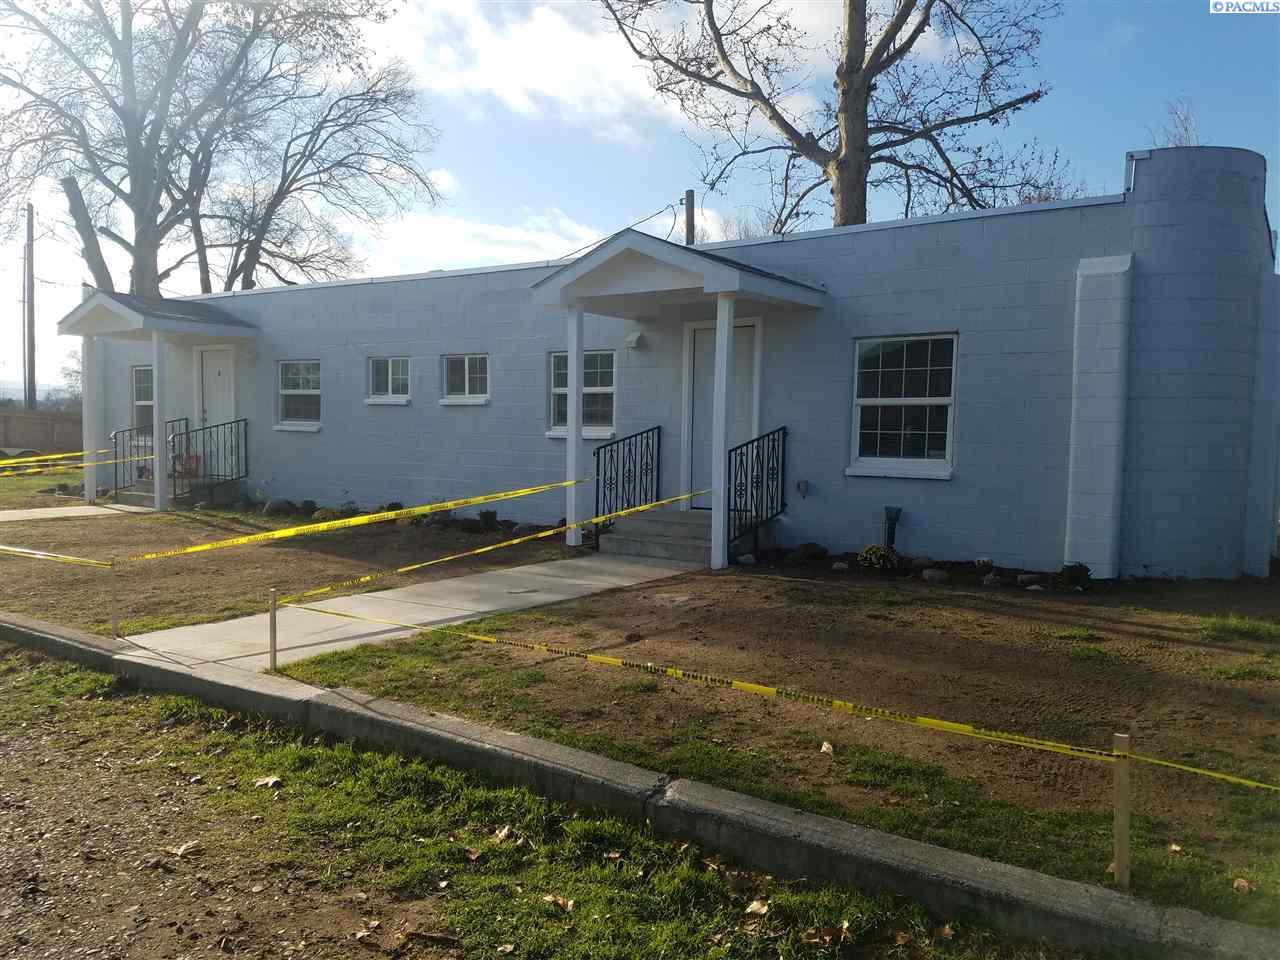 Single Family Home for Sale at 414 E 4th Ave 414 E 4th Ave Kennewick, Washington 99336 United States